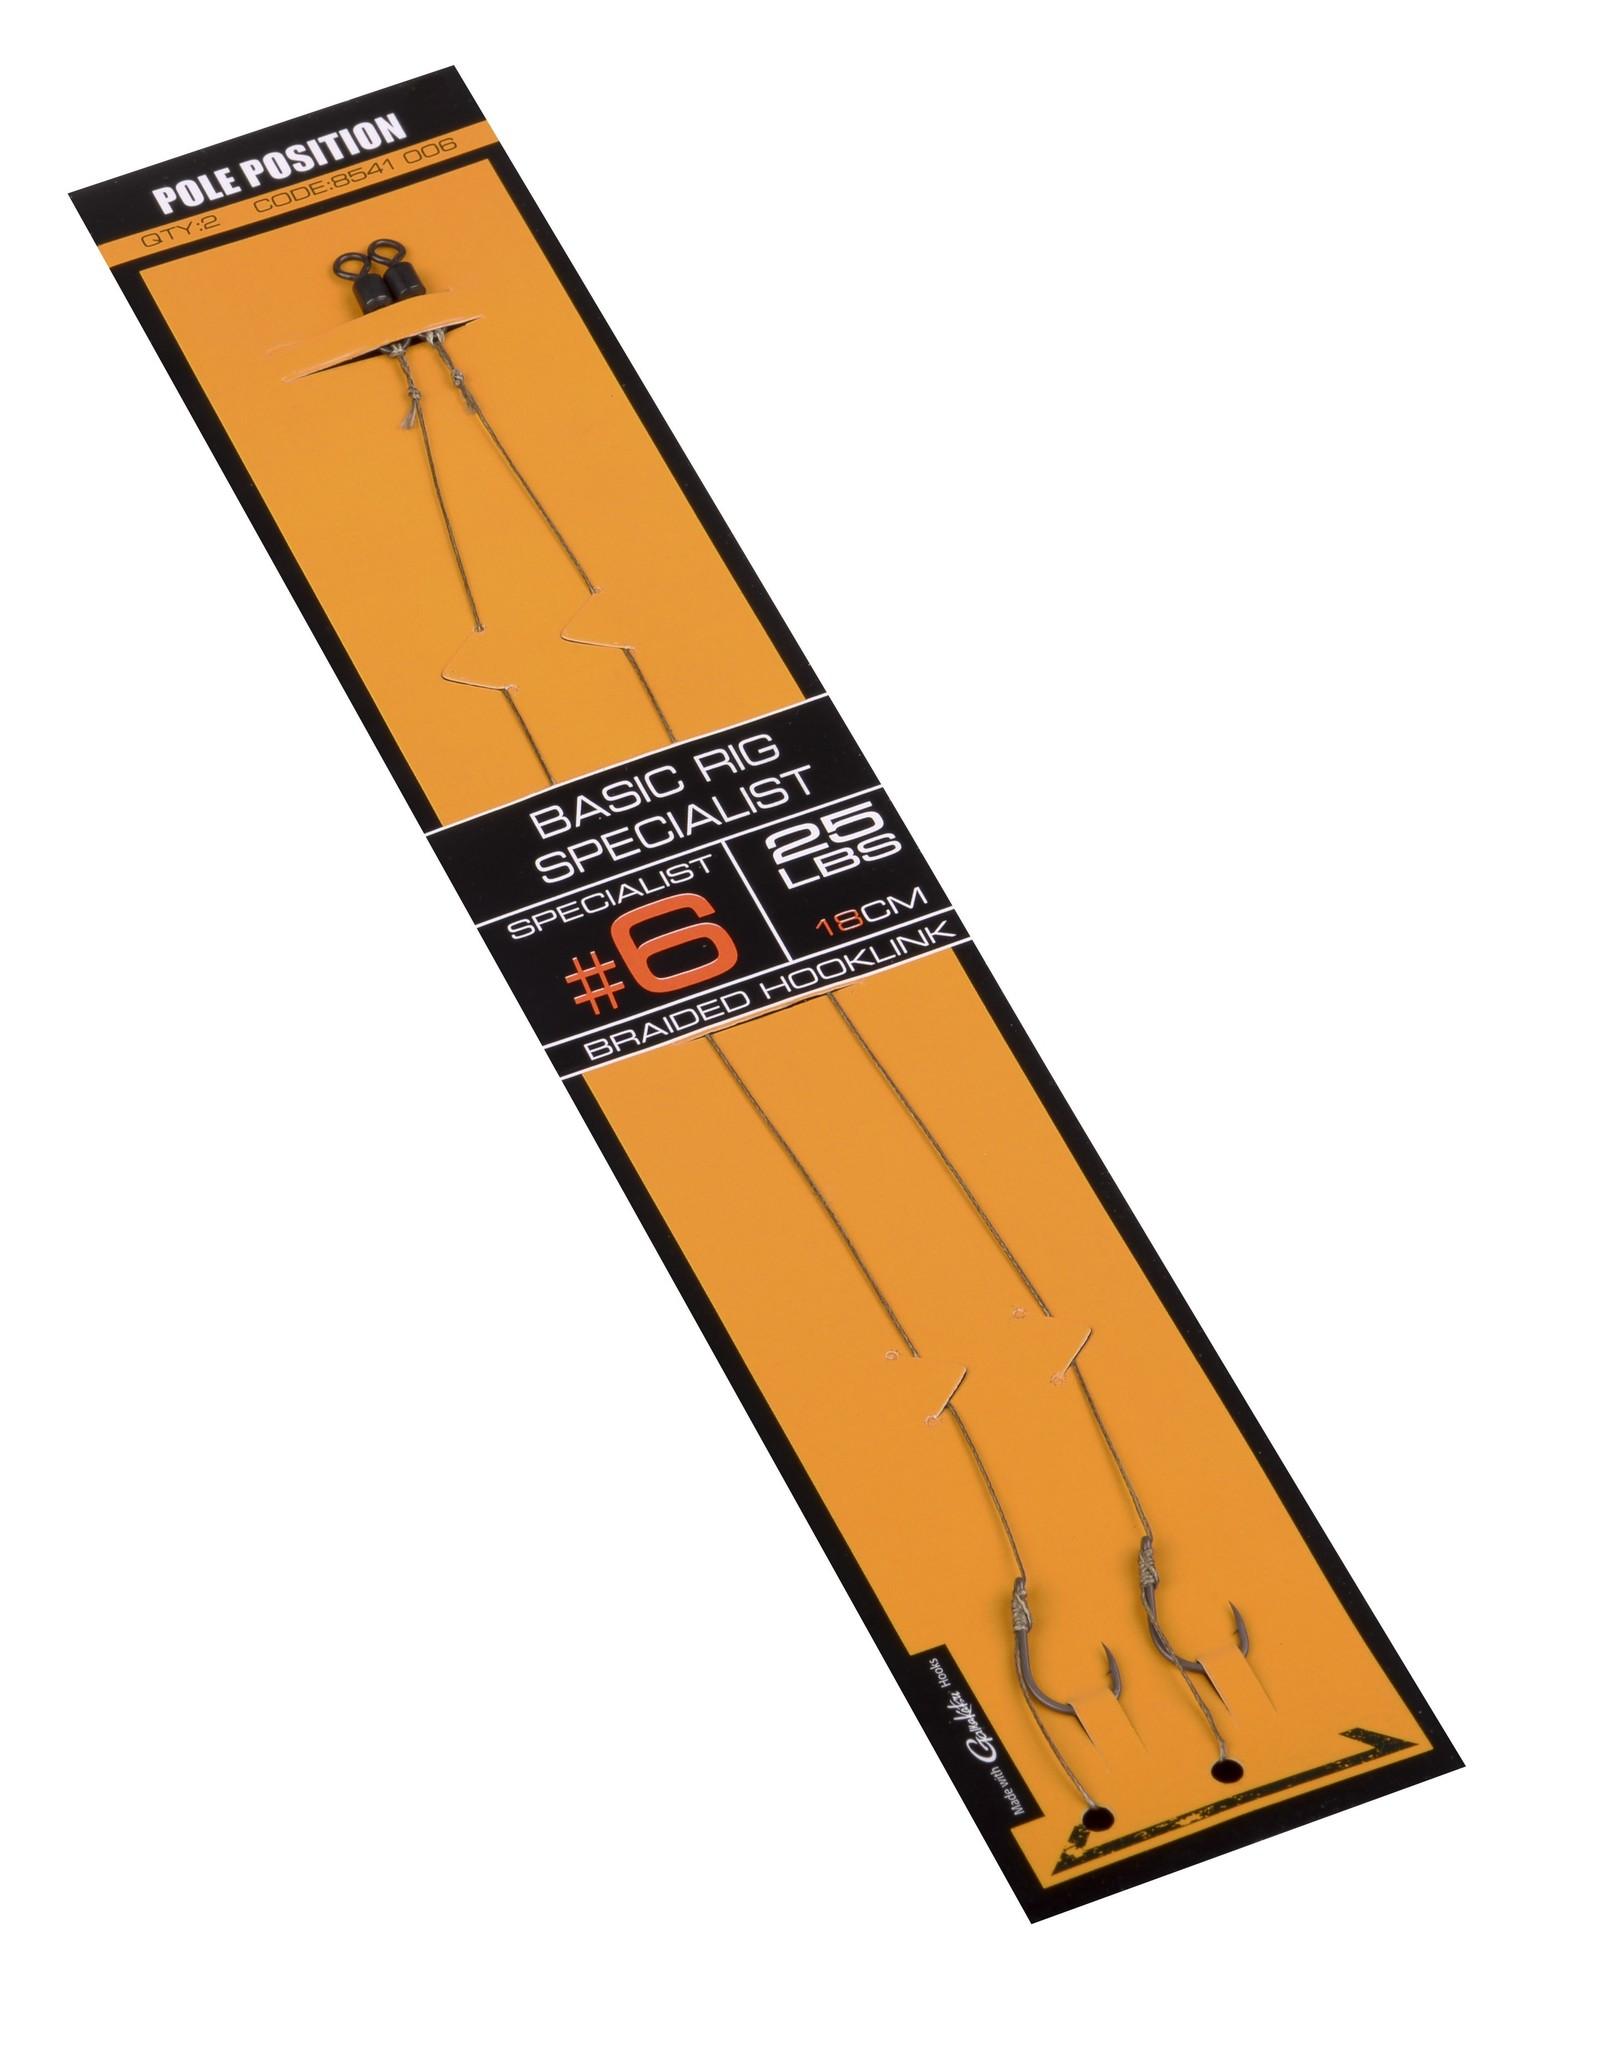 STRTG Pole Position Basic Rig Specialist